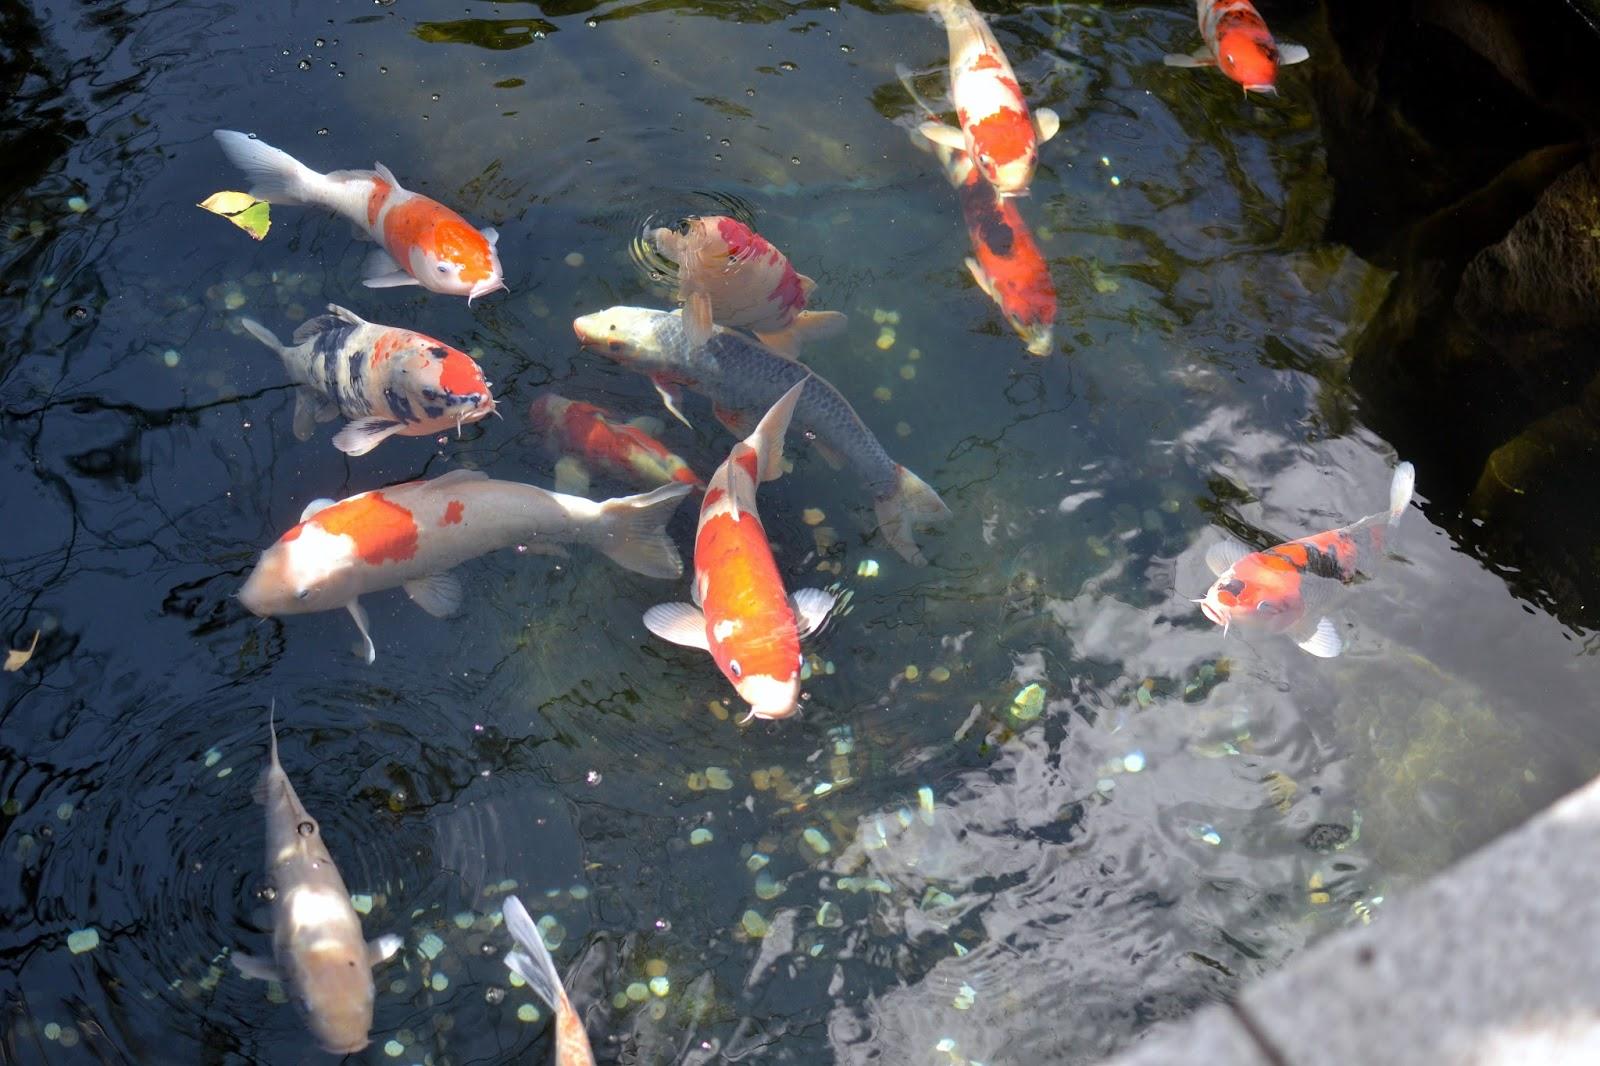 Koi, Hama Rikyu gardens, Park, Nature, Tokyo, Japan, Must to Tokyo,